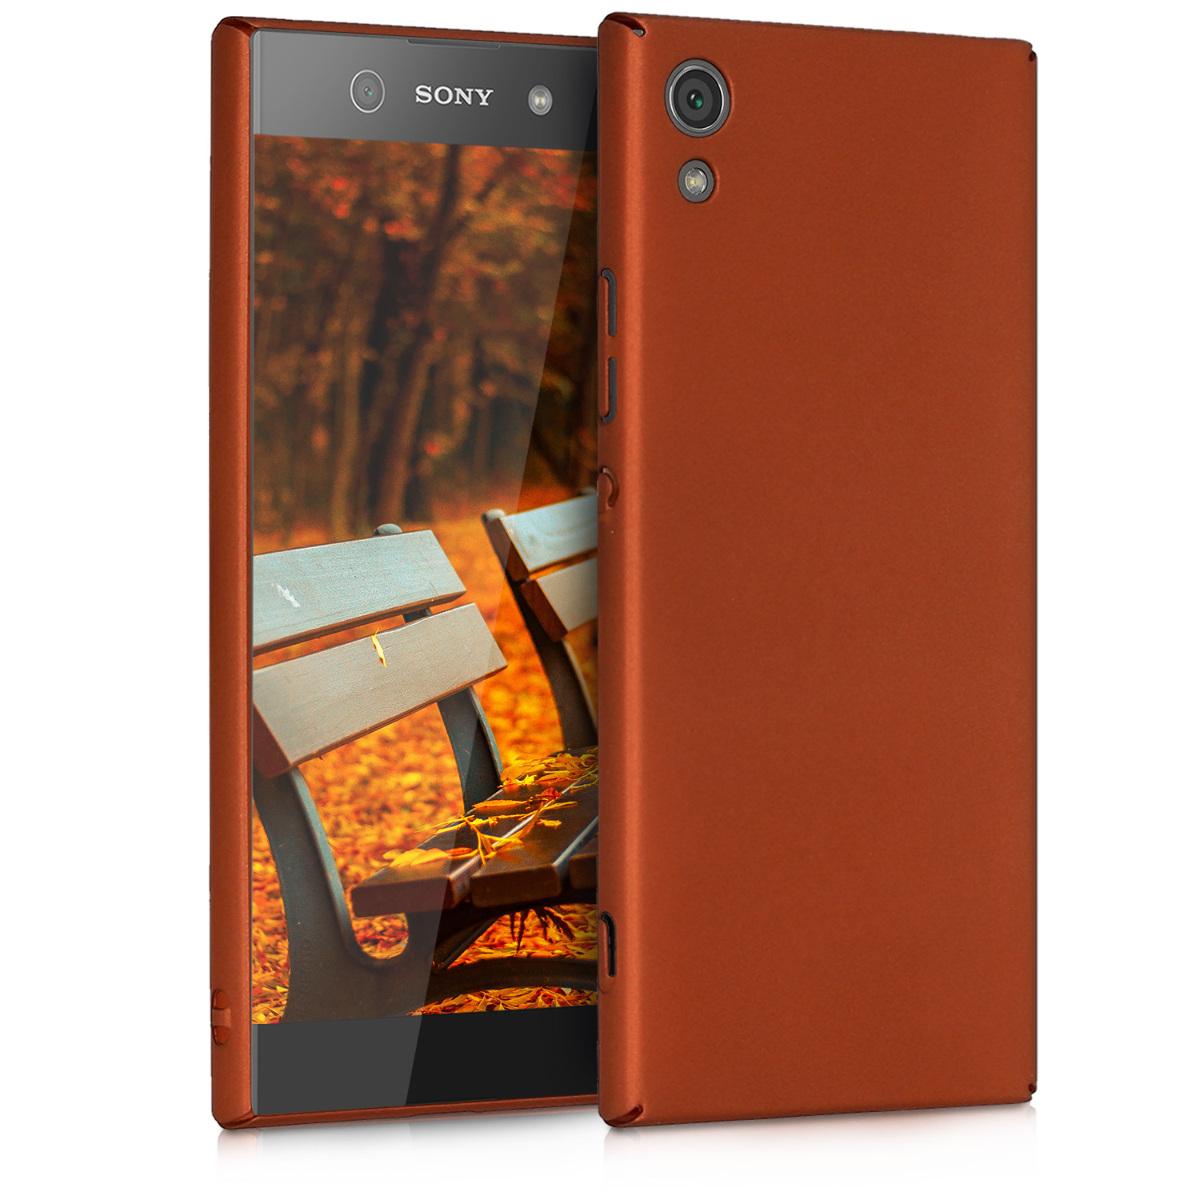 KW Slim Anti-Slip Cover - Σκληρή Θήκη Καουτσούκ Sony Xperia XA1 - Χάλκινο /Μεταλλικό (42870.27)